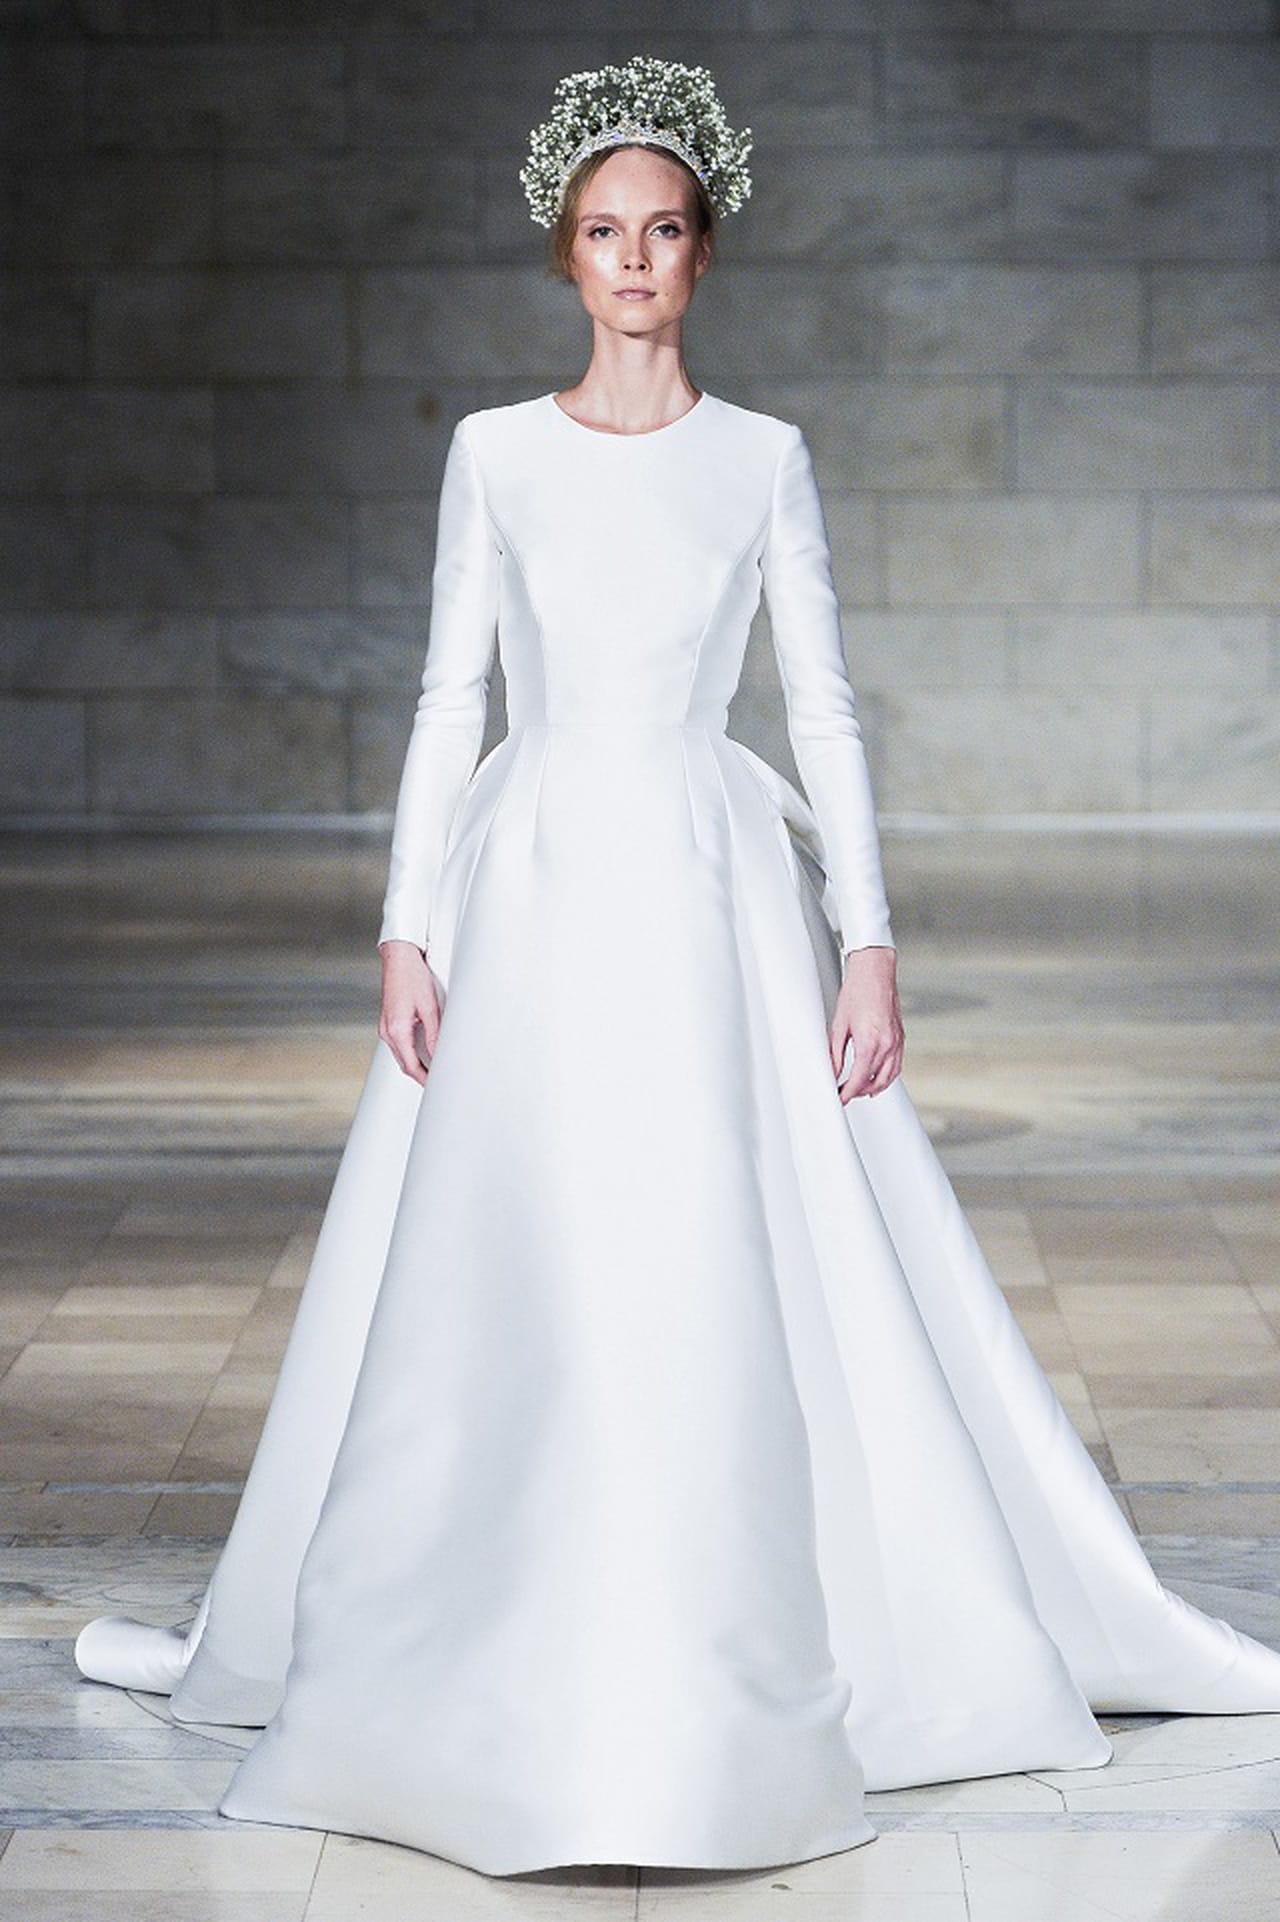 60bab6b02 فستان الافتتاحية في مجموعة زفاف ريم عكرا خريف 2018